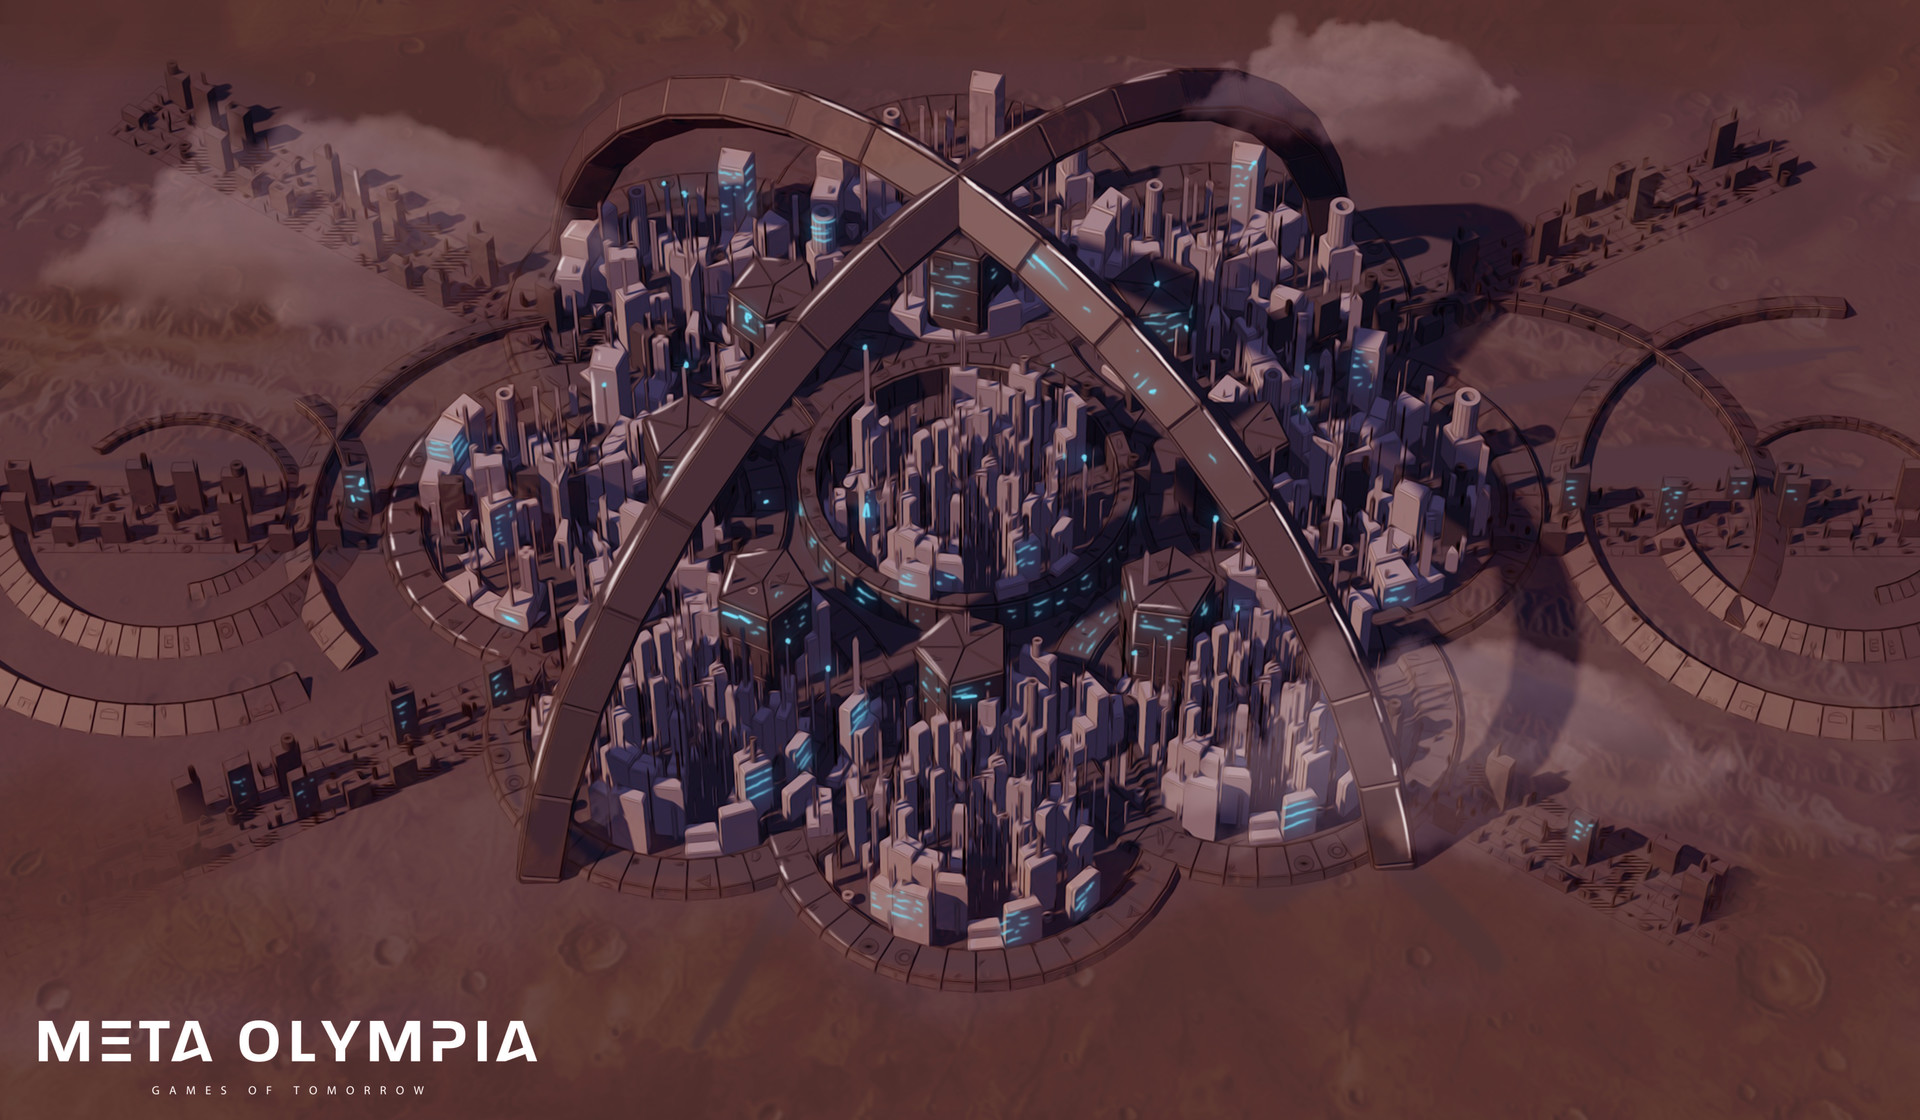 Meta olympia environment 2